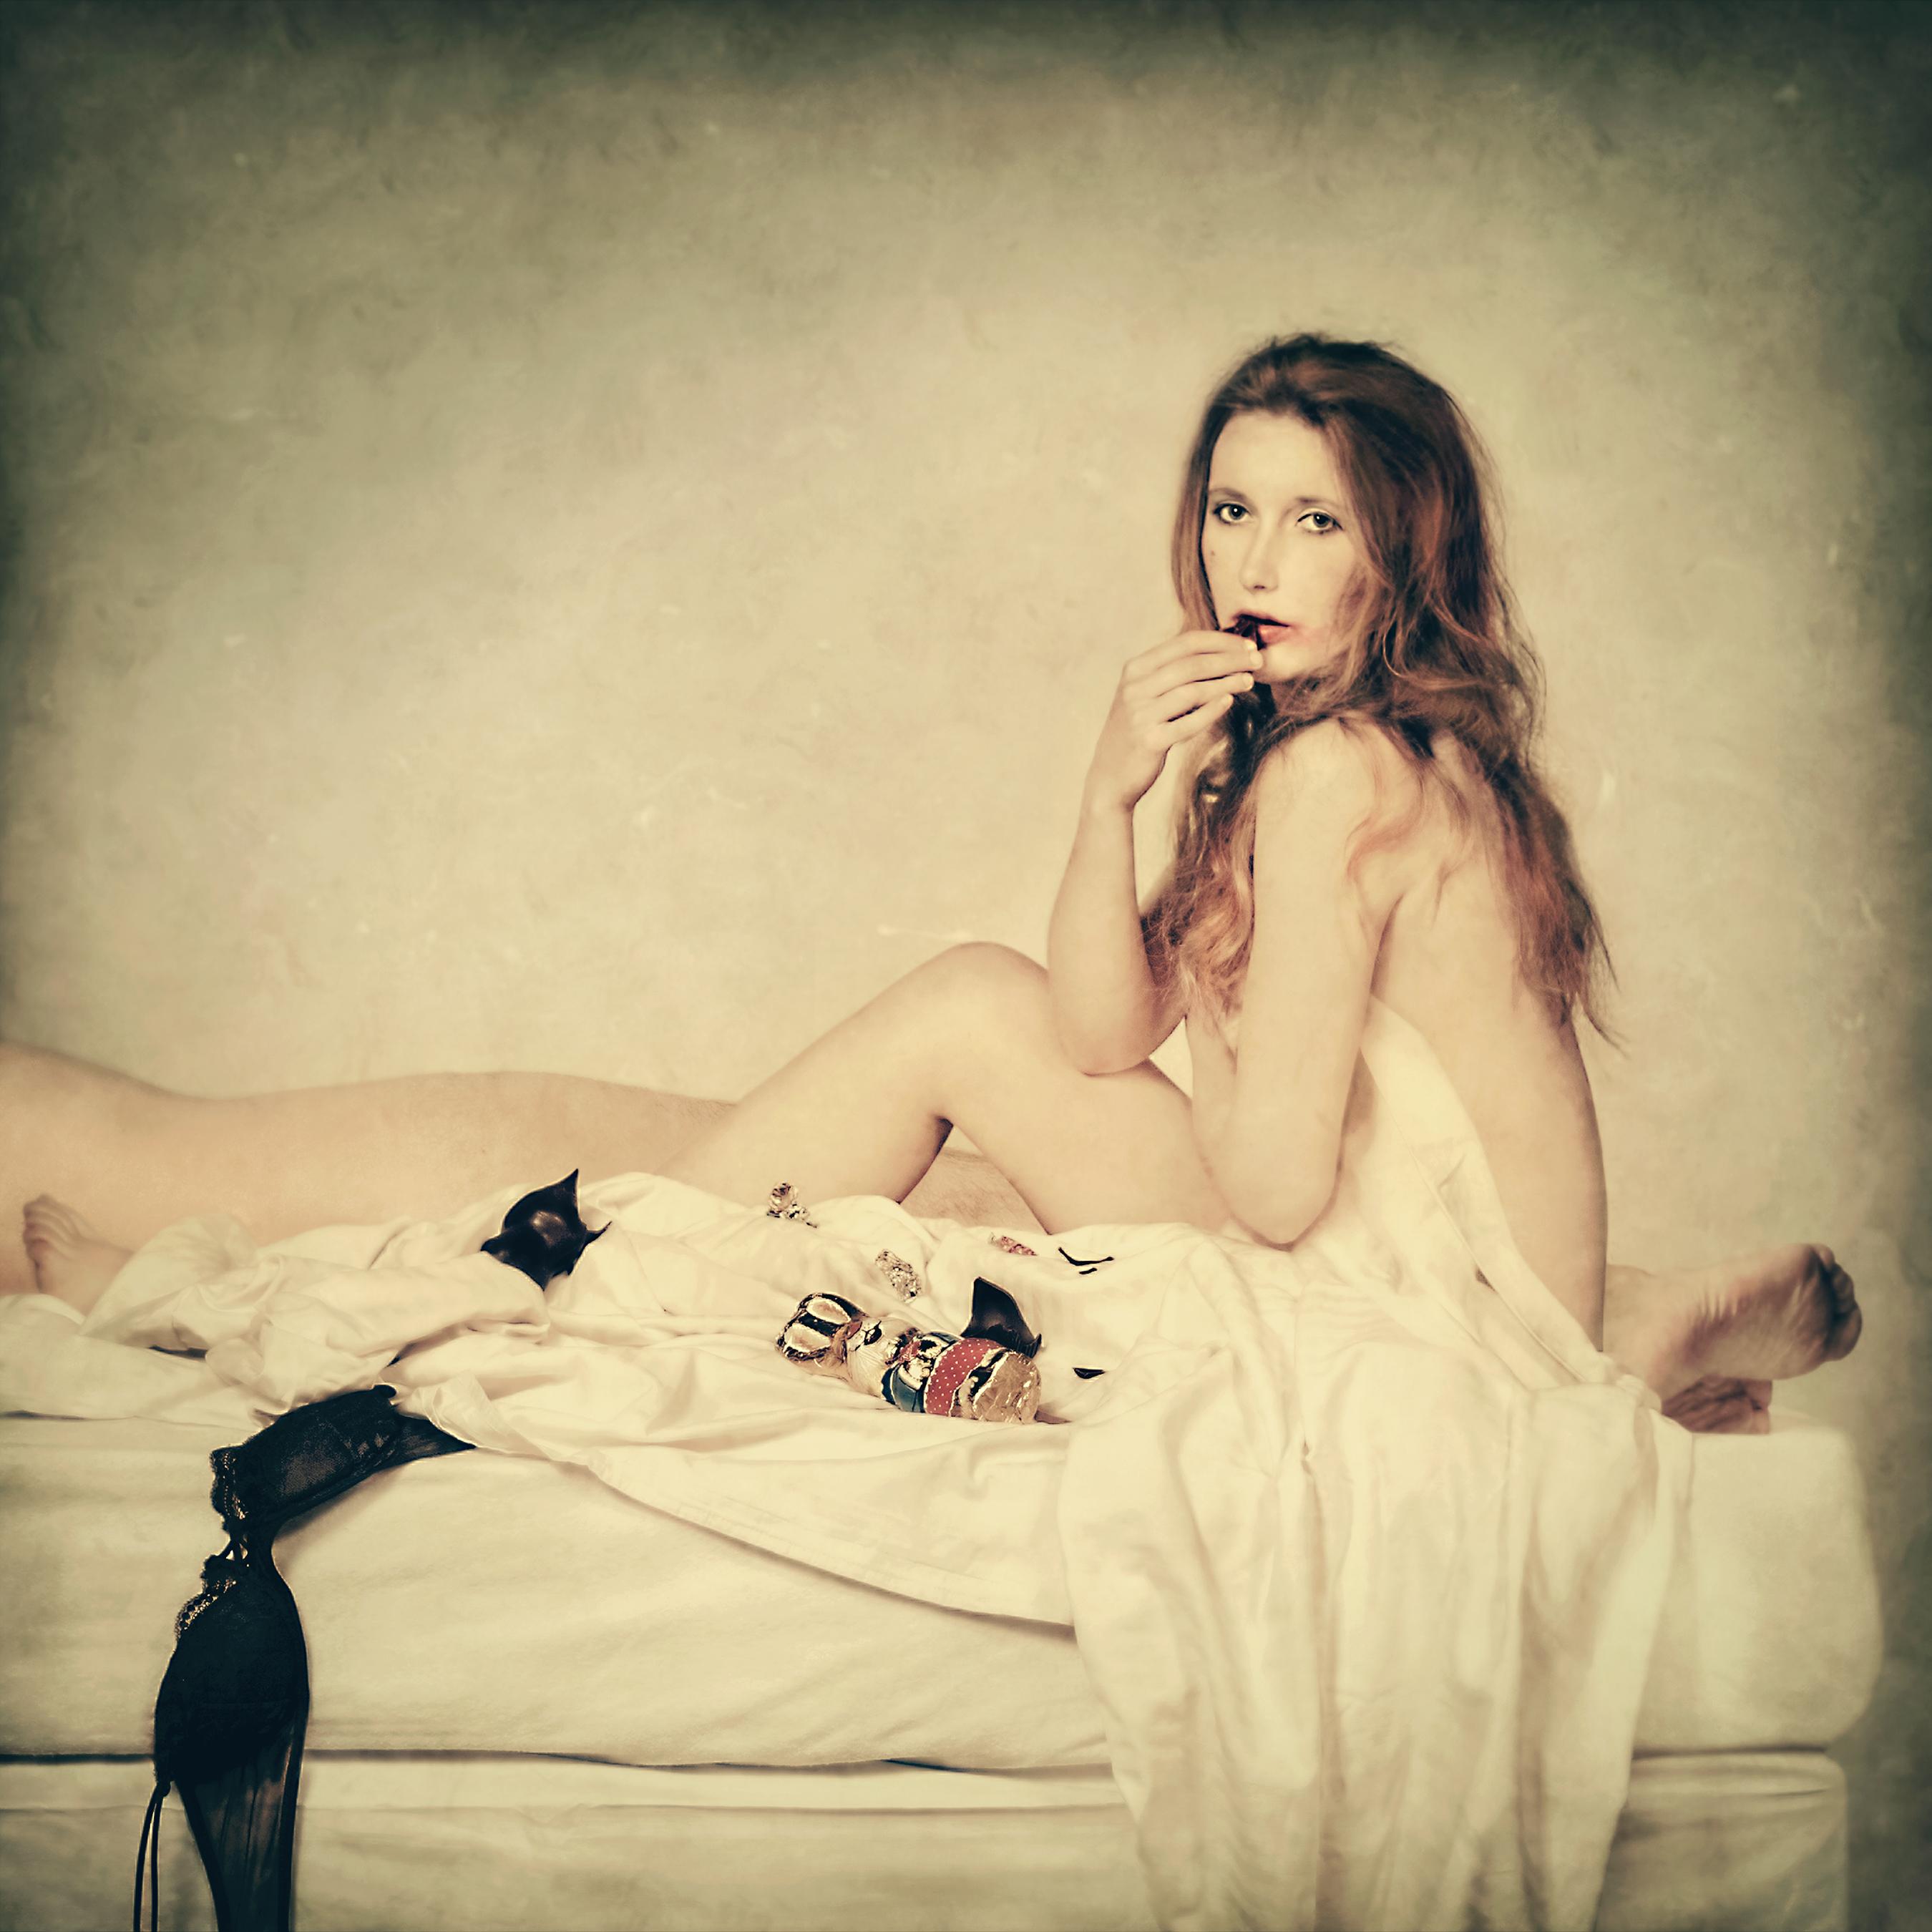 fine-art-fotografie-fotograaf-portret